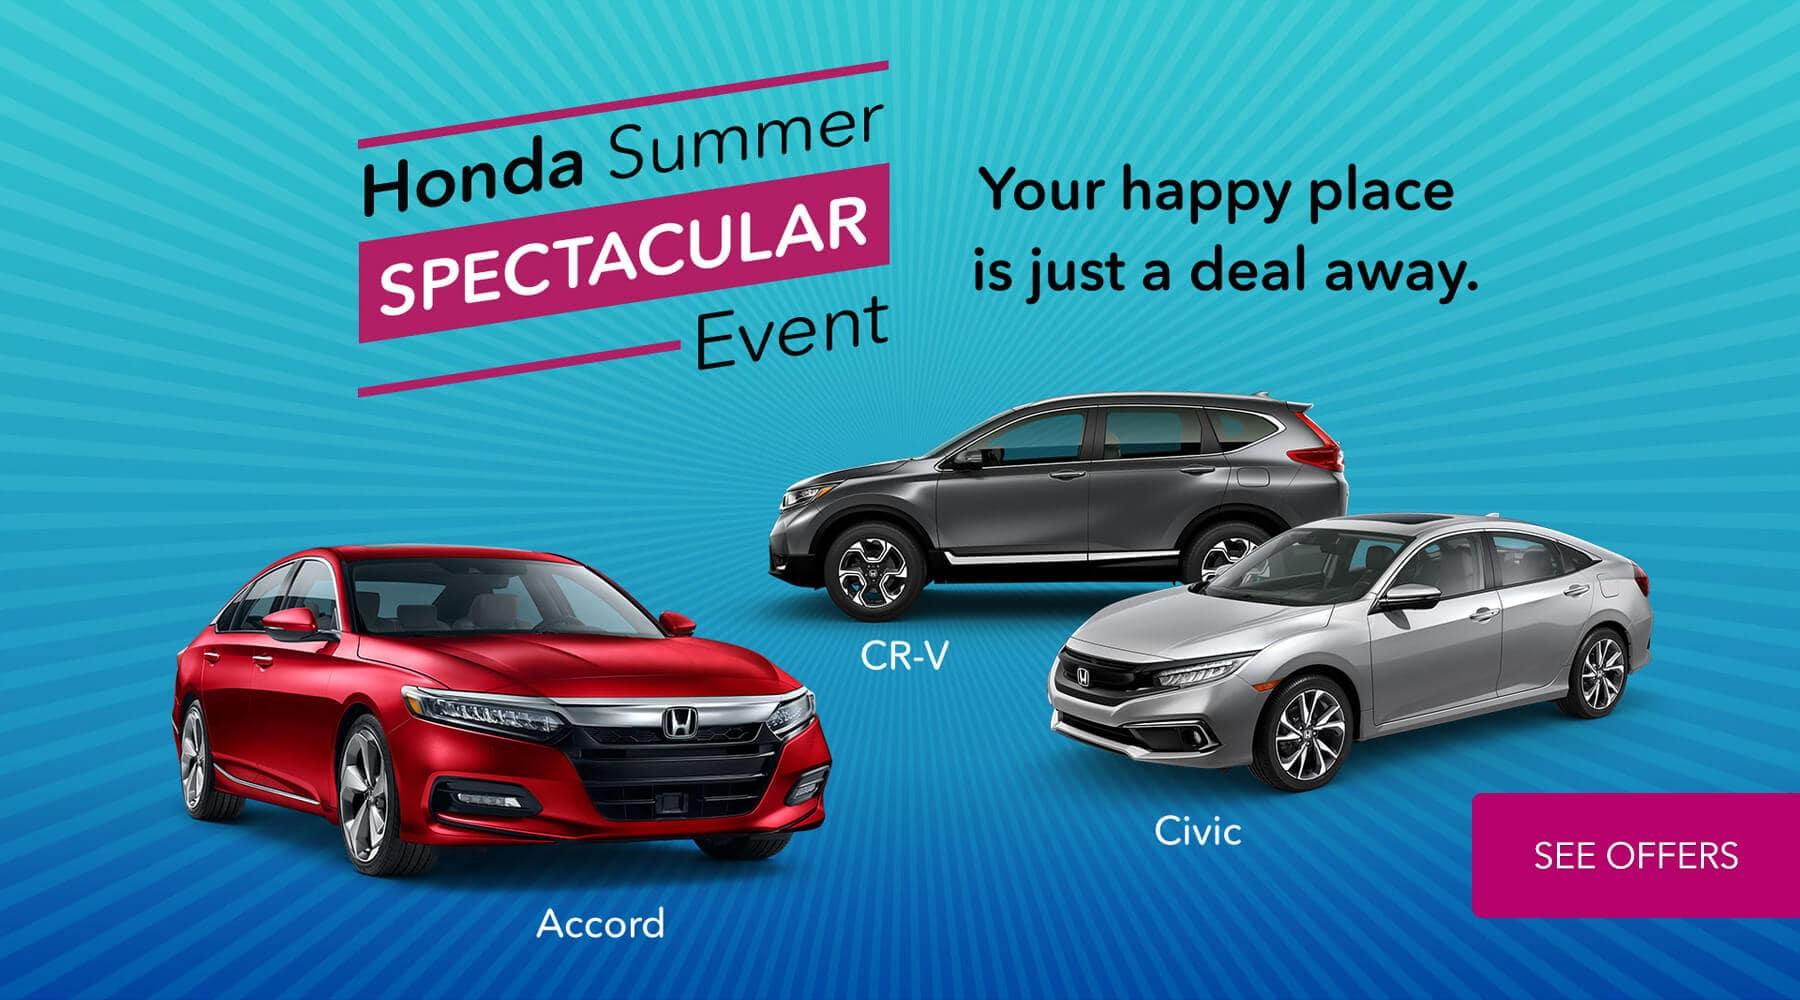 2019 Honda Summer Spectacular Event HP Slide